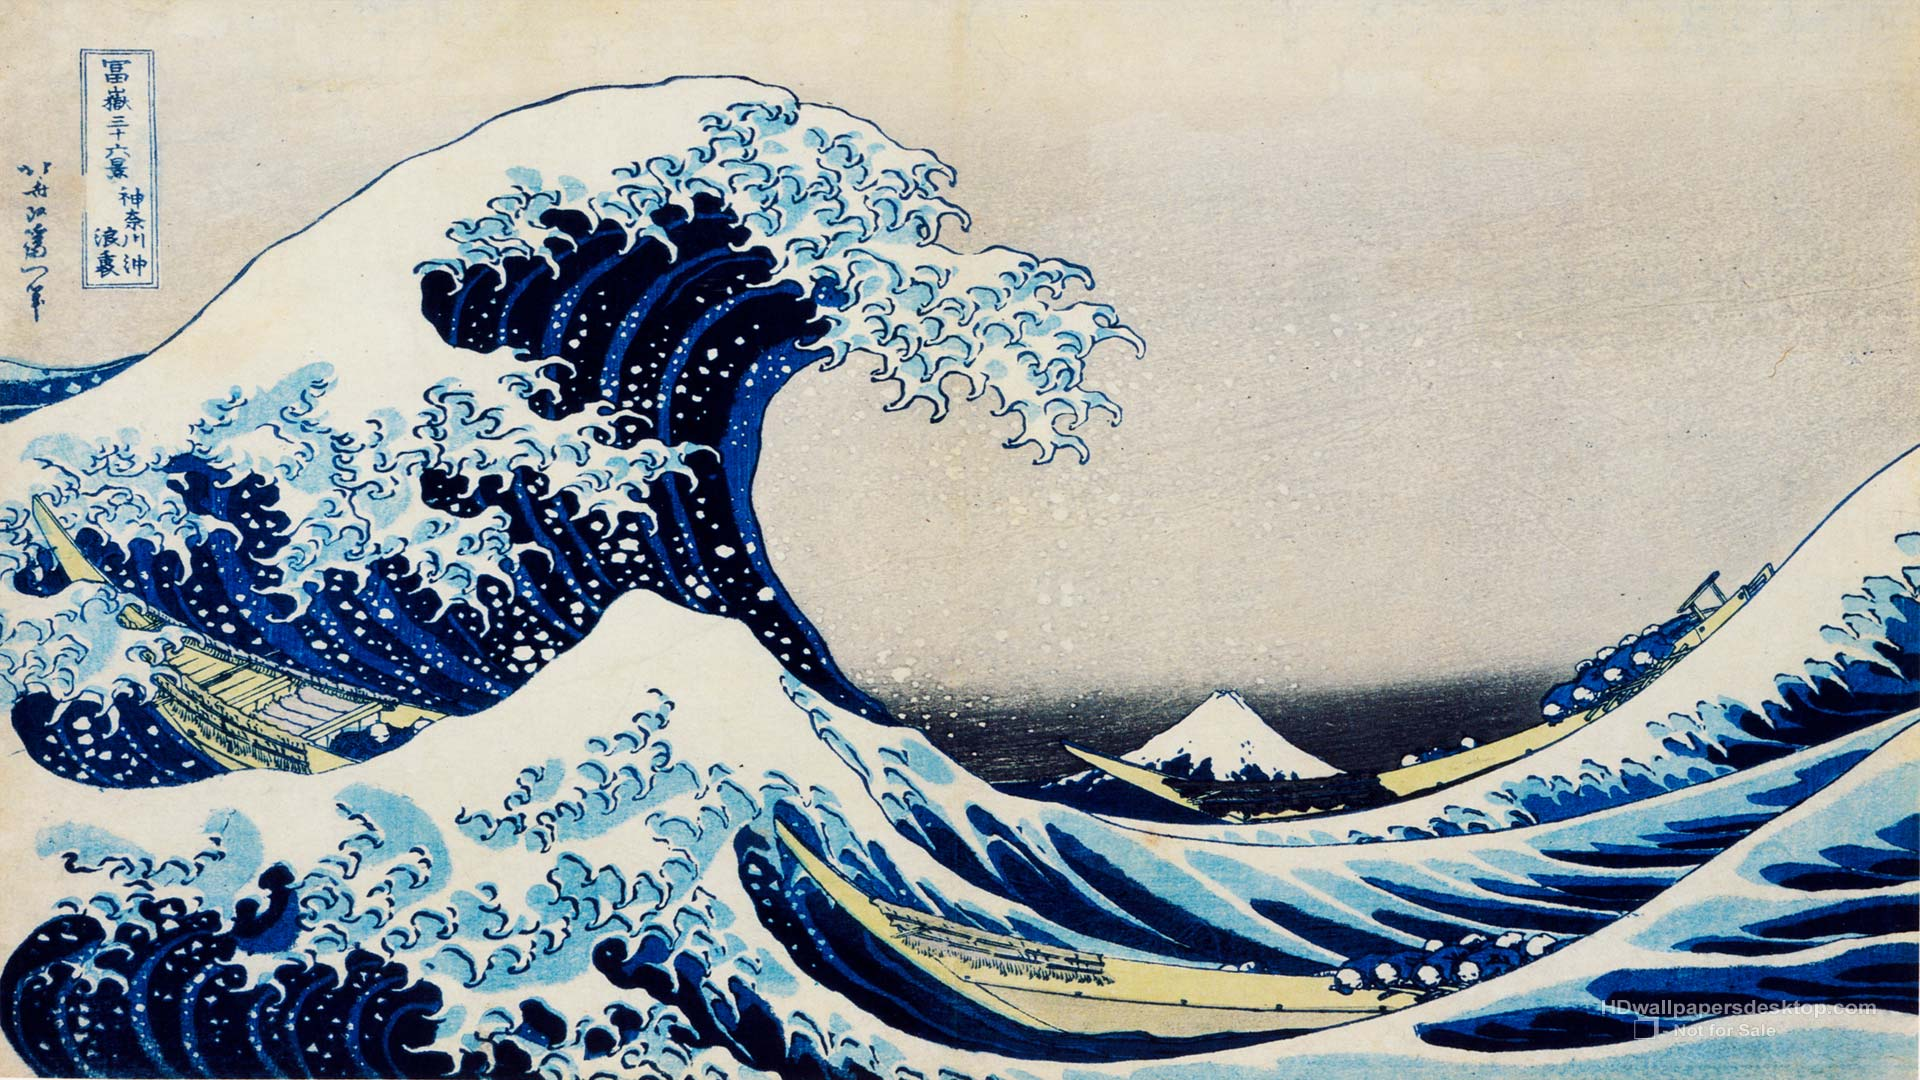 Japanese Art Wallpapers Japanese Ukiyo e Wallpaper Art Wallpaper 1920x1080